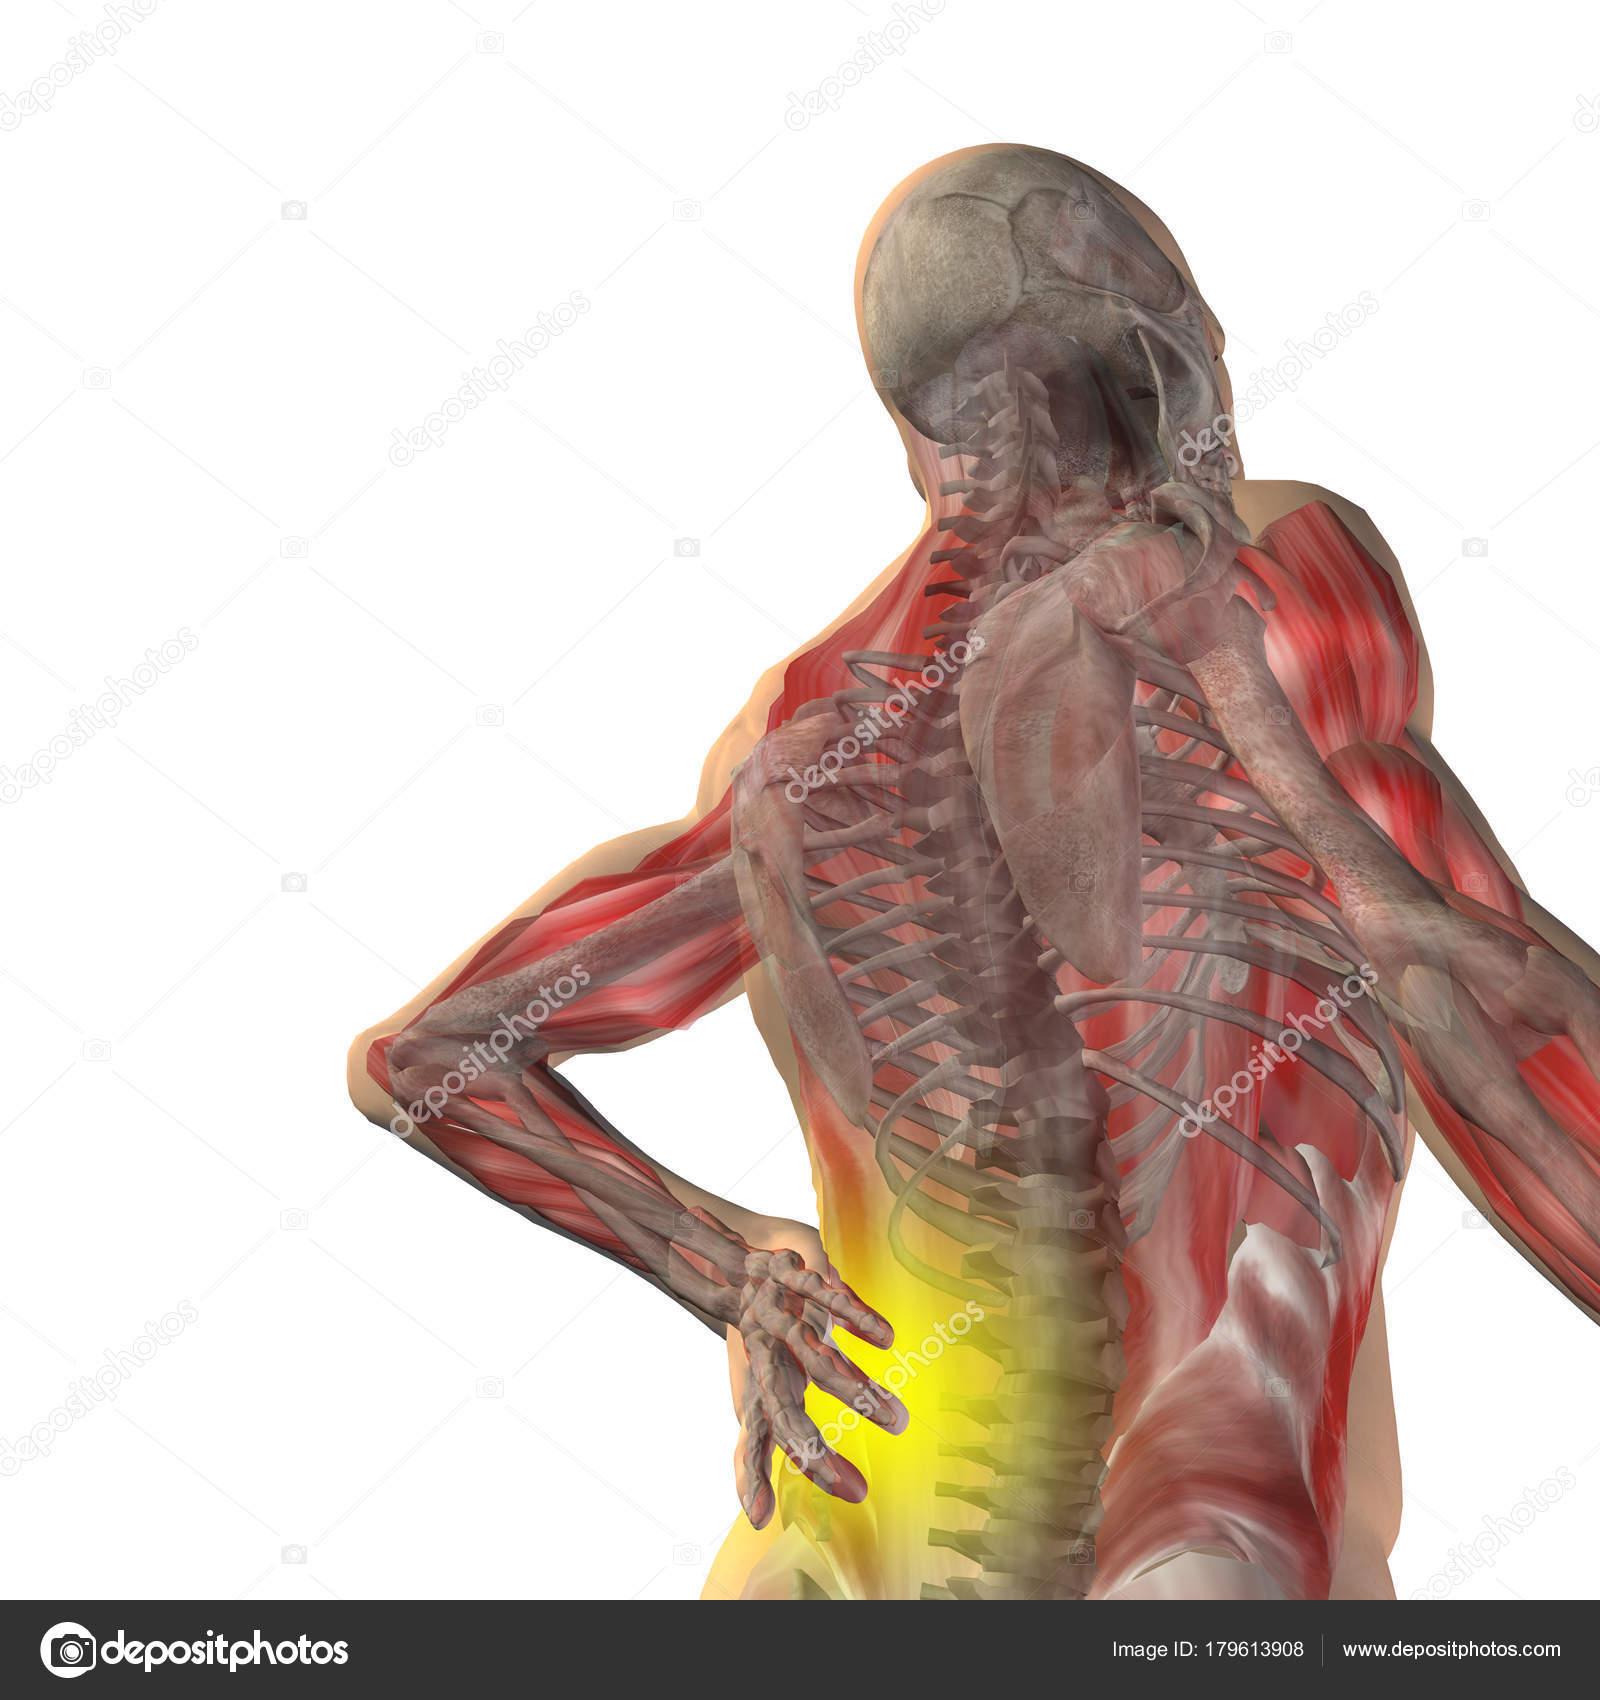 man anatomy with back pain — Stock Photo © design36 #179613908